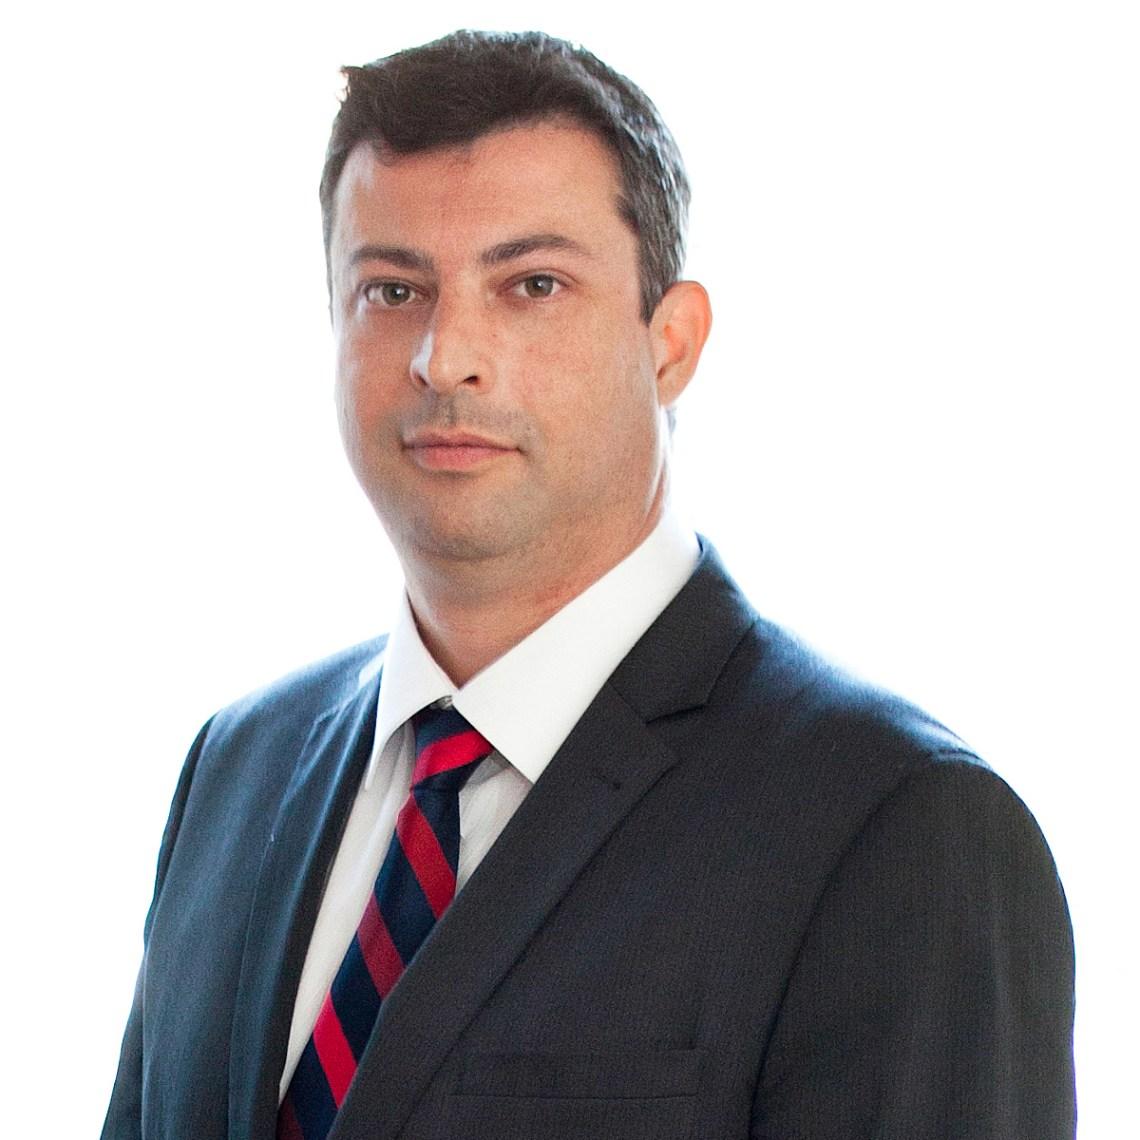 GUILLAUME CATTIAUX, CEO